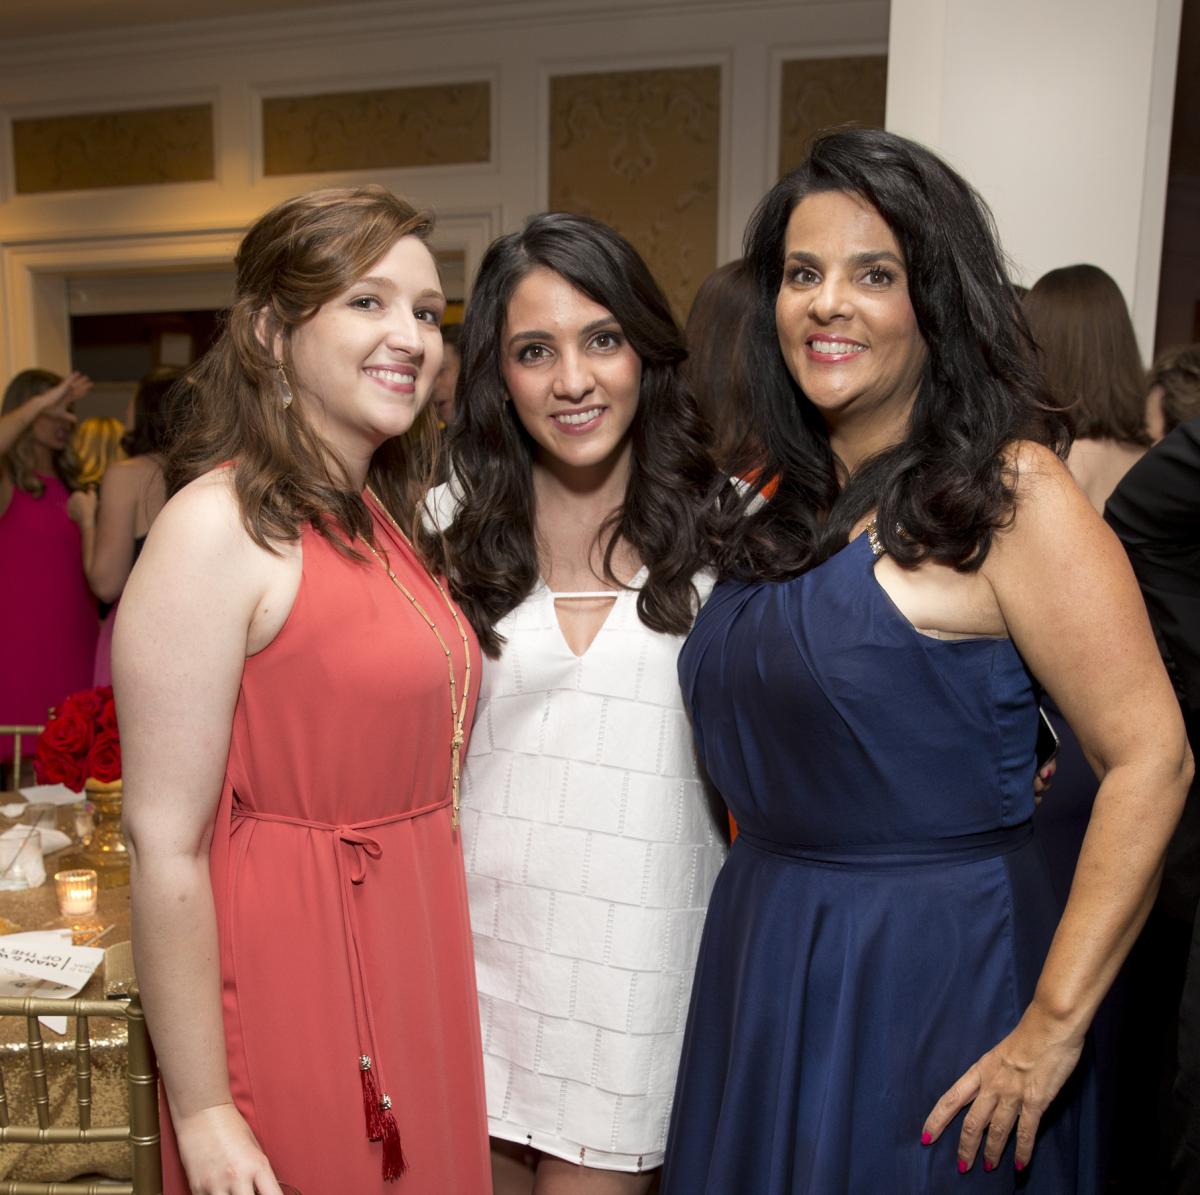 Leukemia & Lymphoma Society gala, 4/16, Chelsea Moriarty, Erica Moriarty, Inez Moriarty